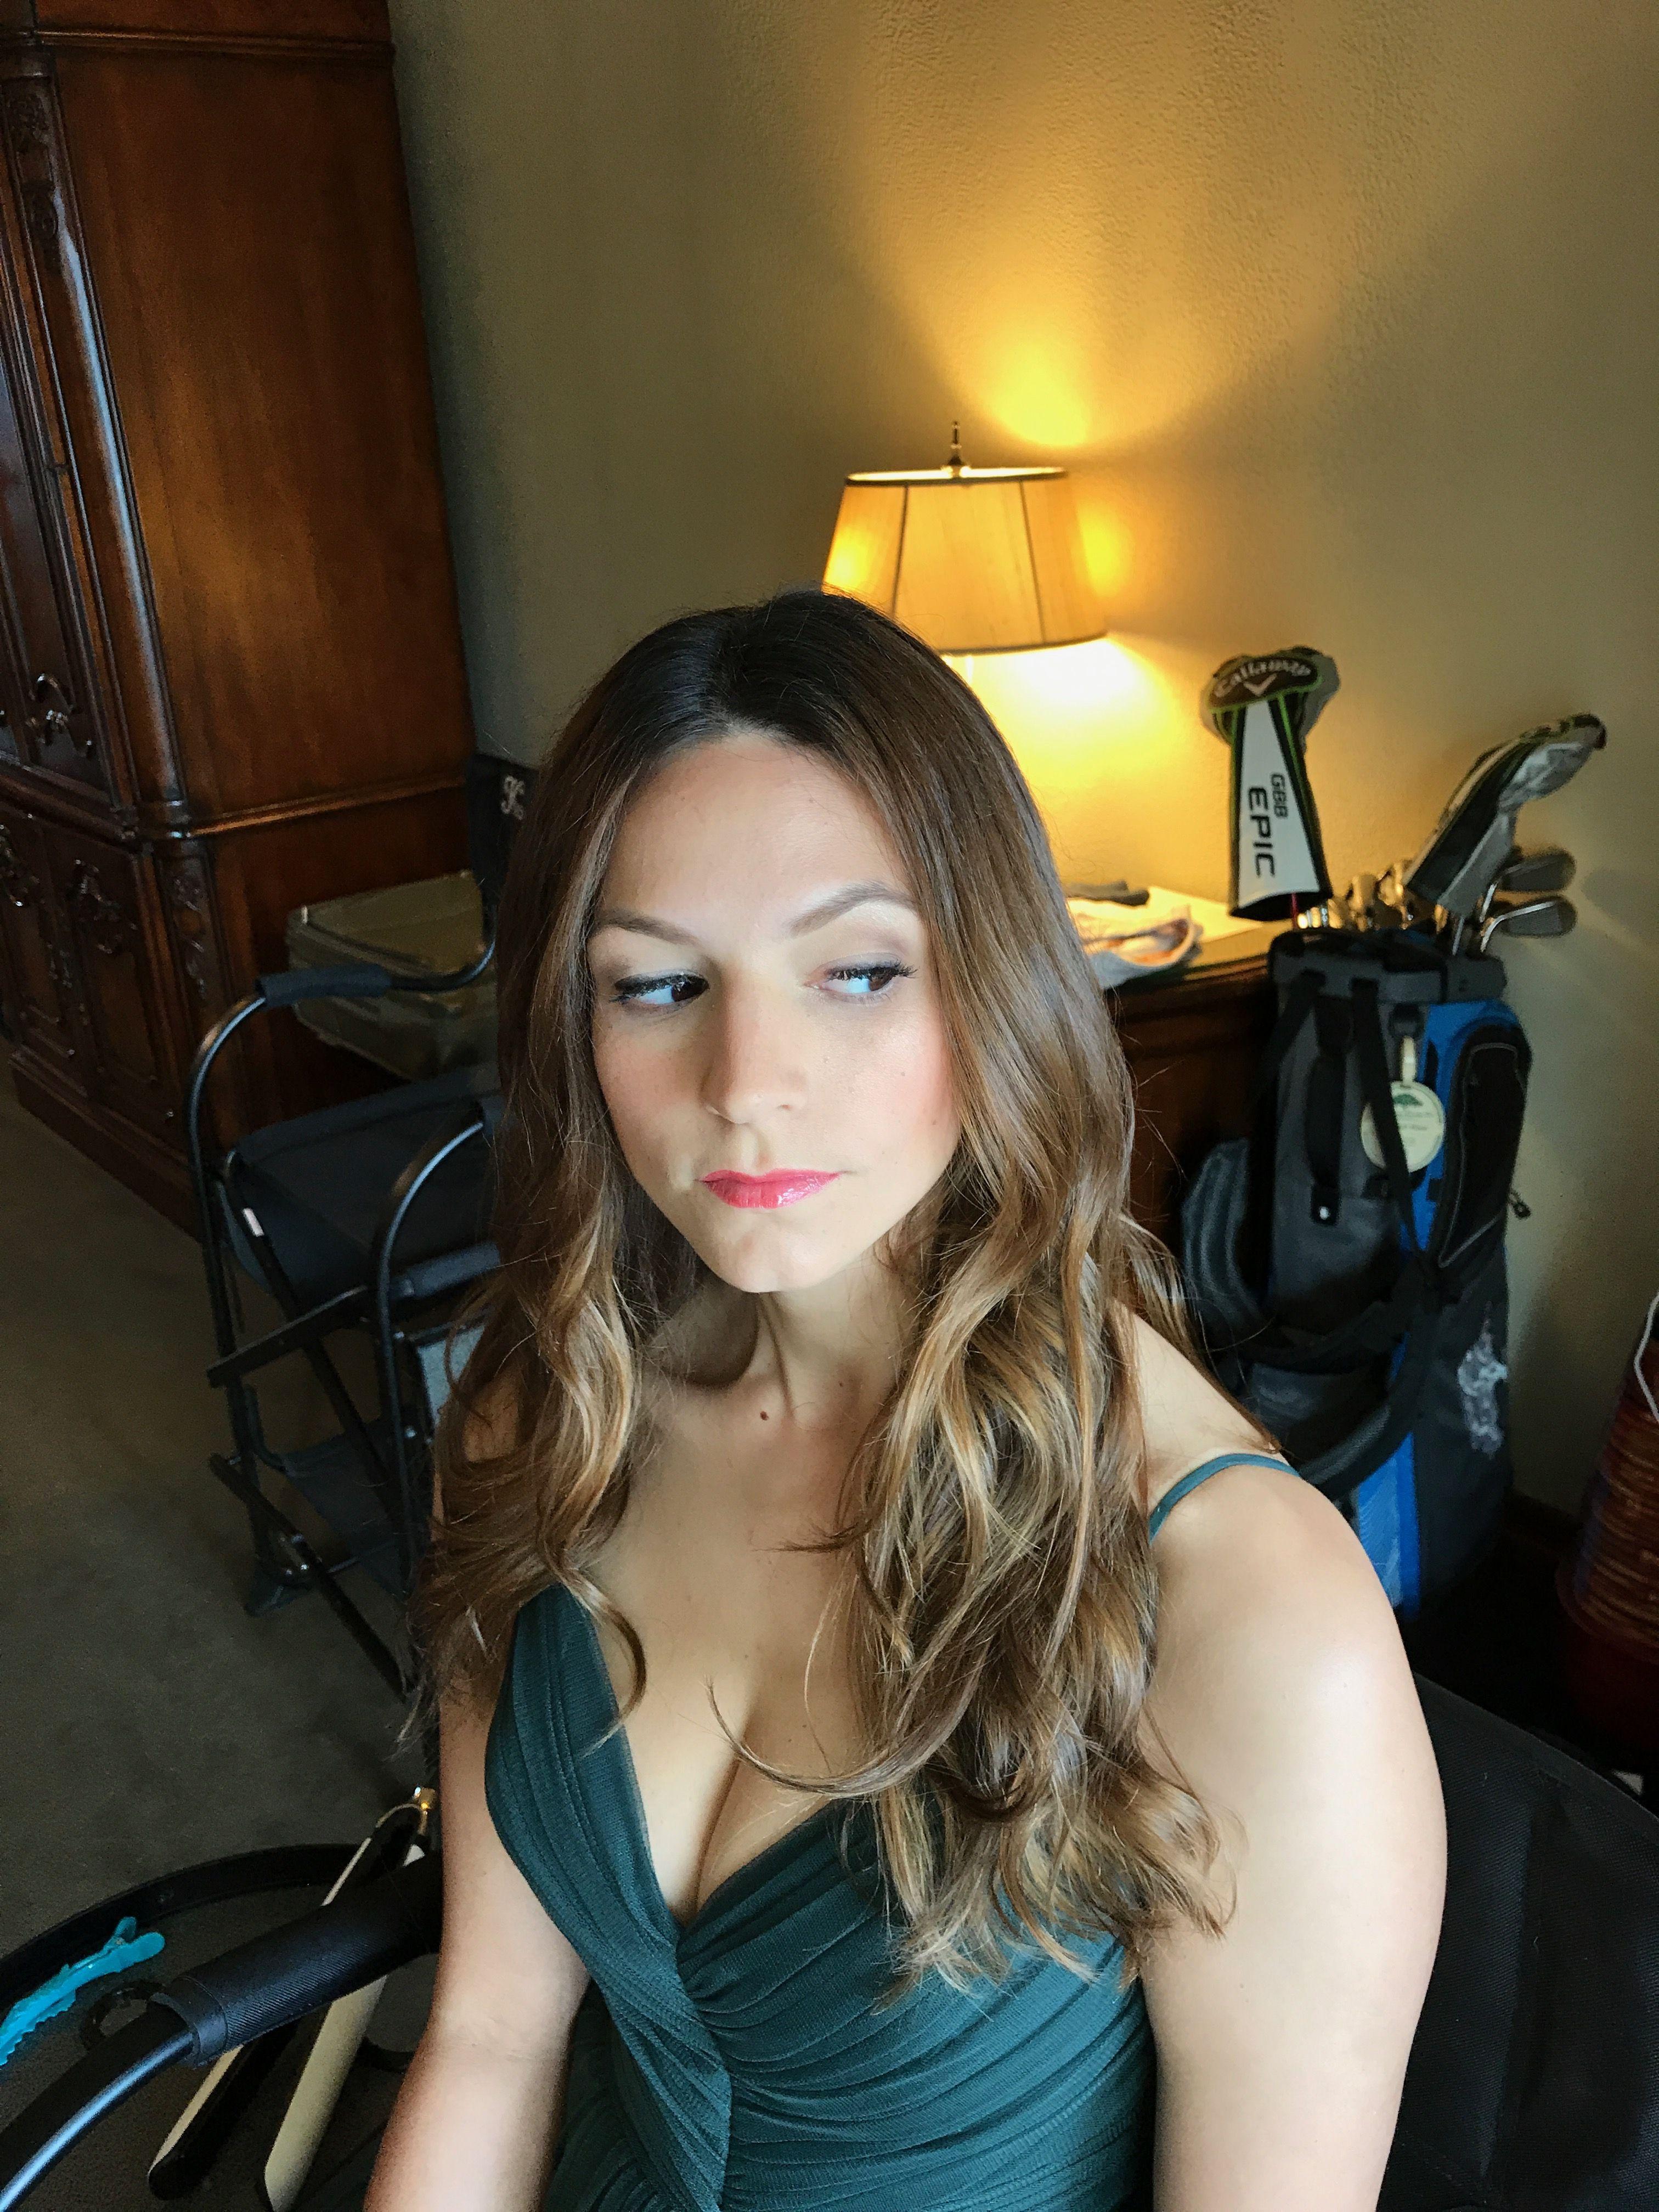 hair and makeup by kat oropallo #katherine elizabeth salon